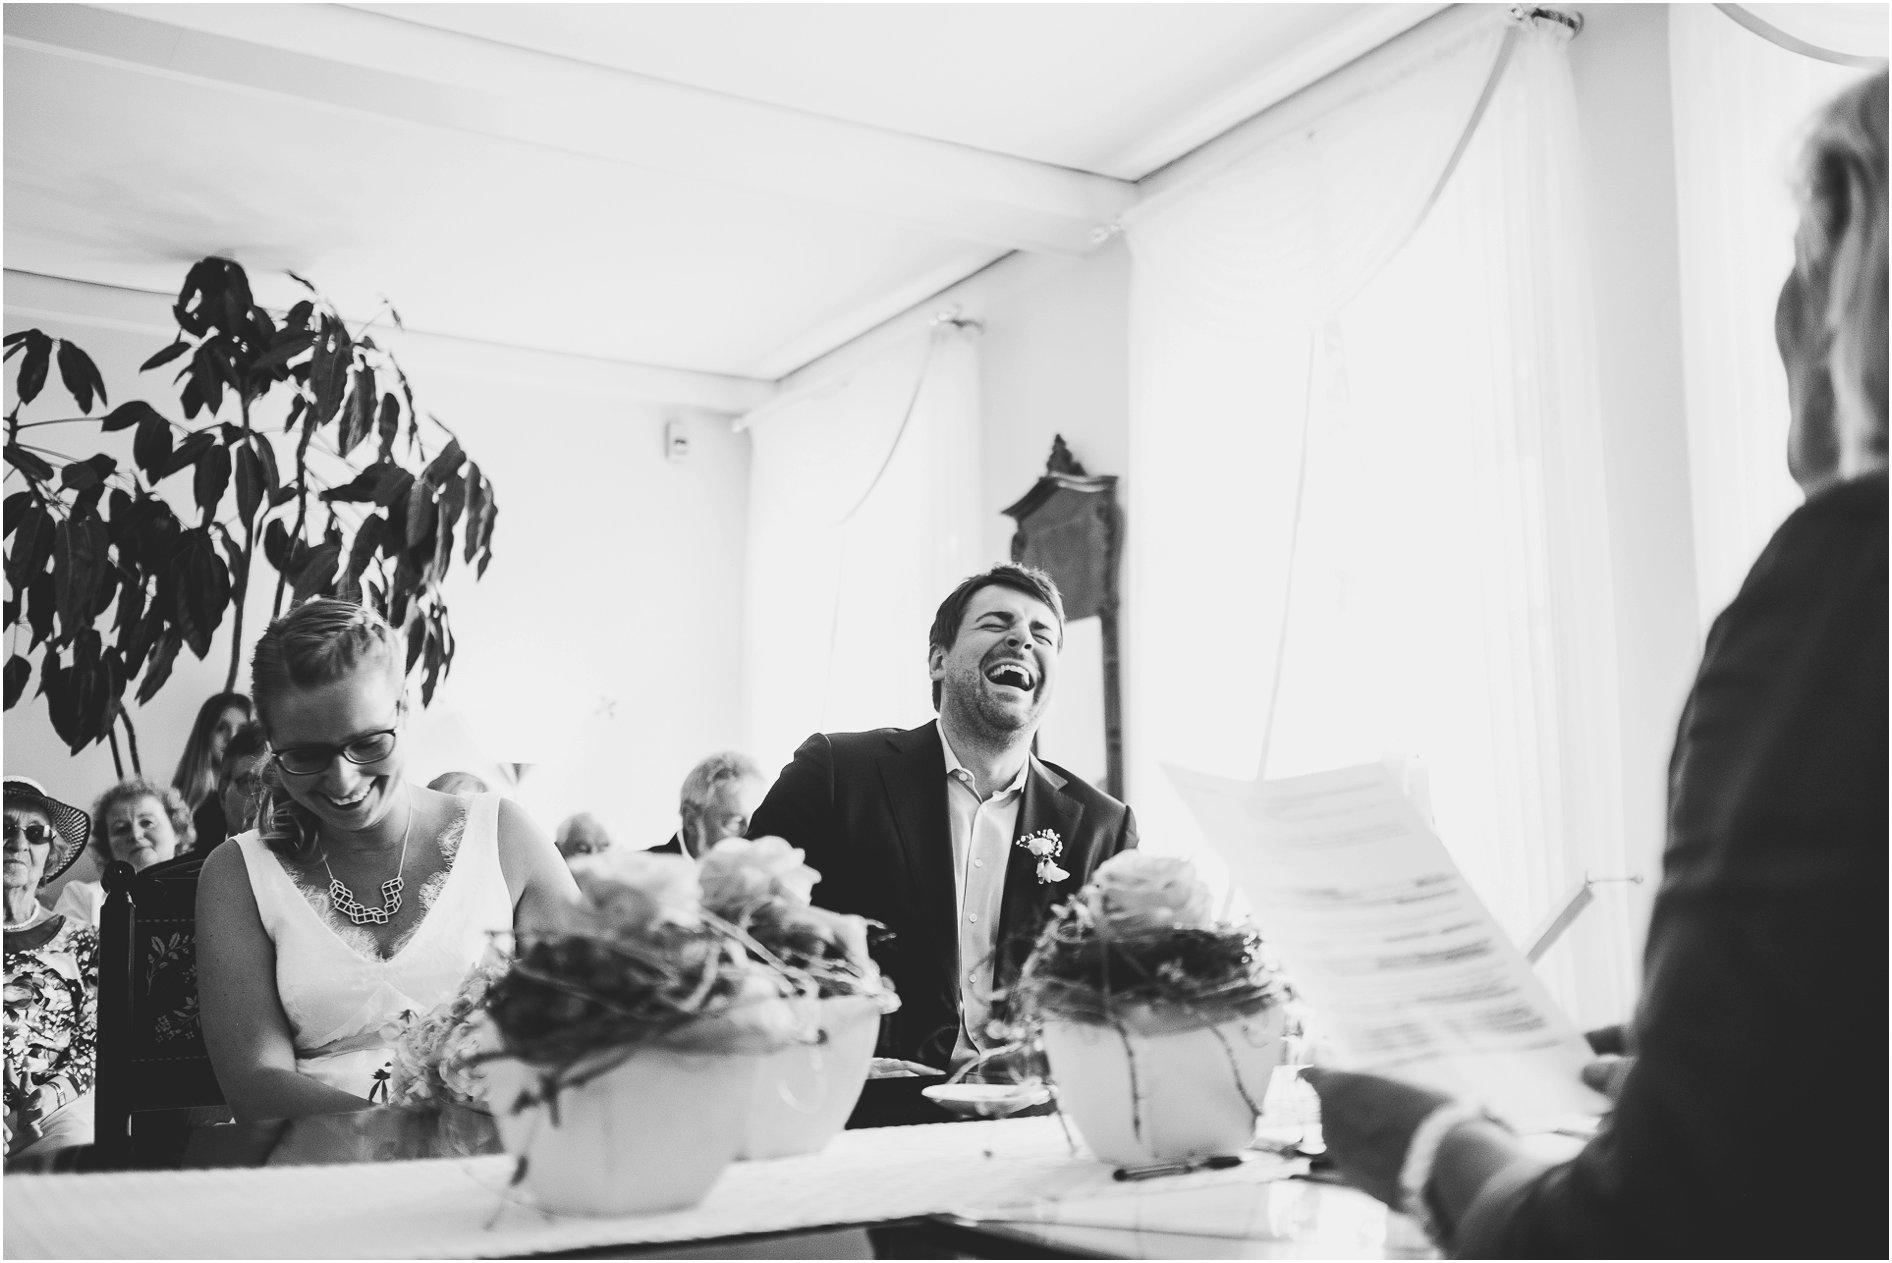 2016-04-19_0025 Sandra & Janis - Hochzeitsfotograf in Seevetal